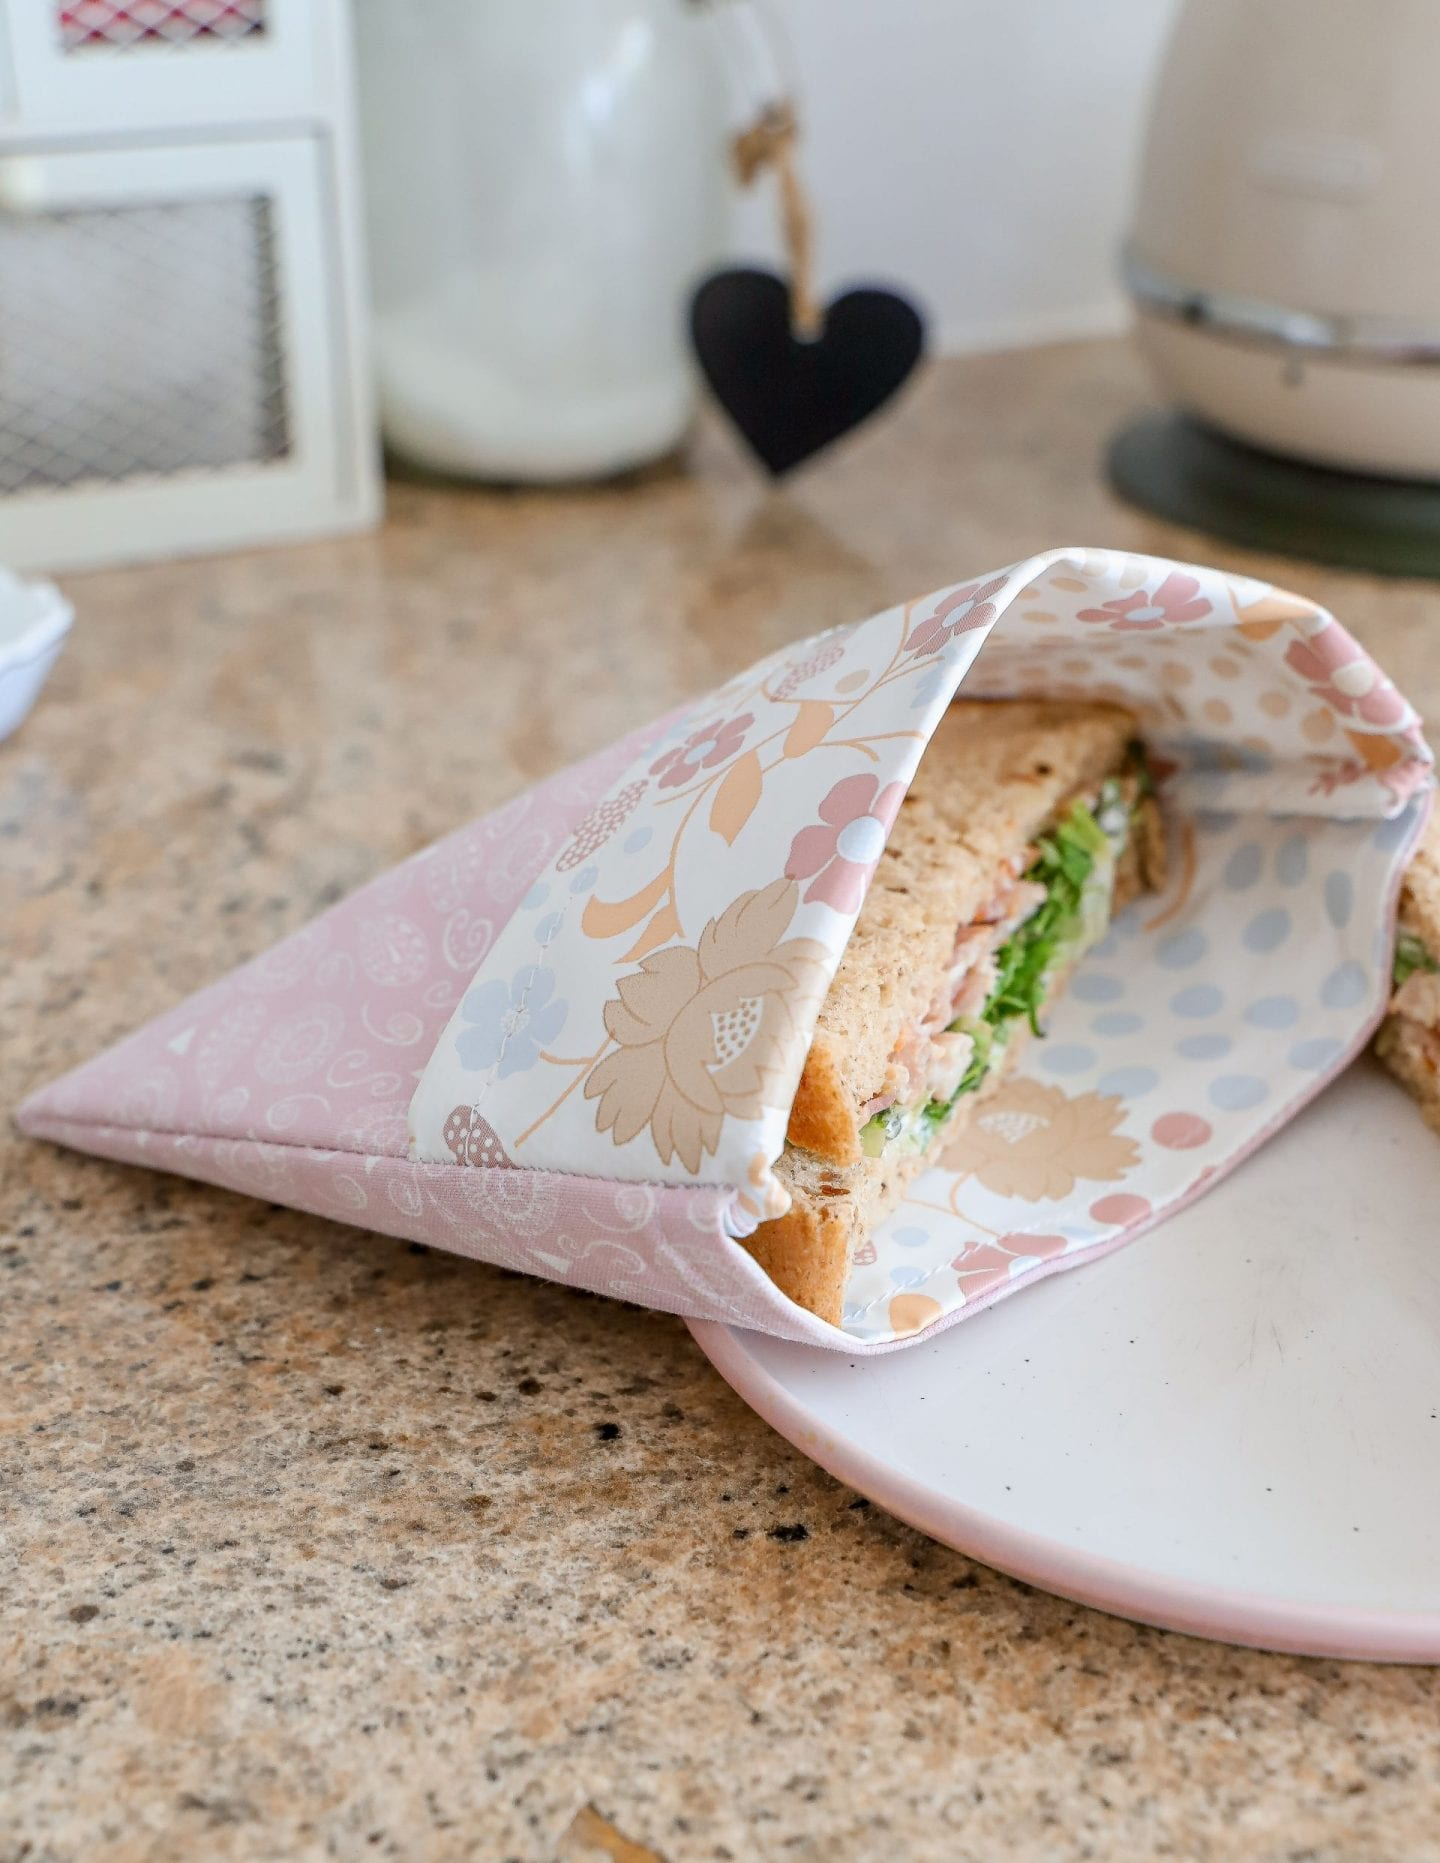 How to make a reusable sandwich bag